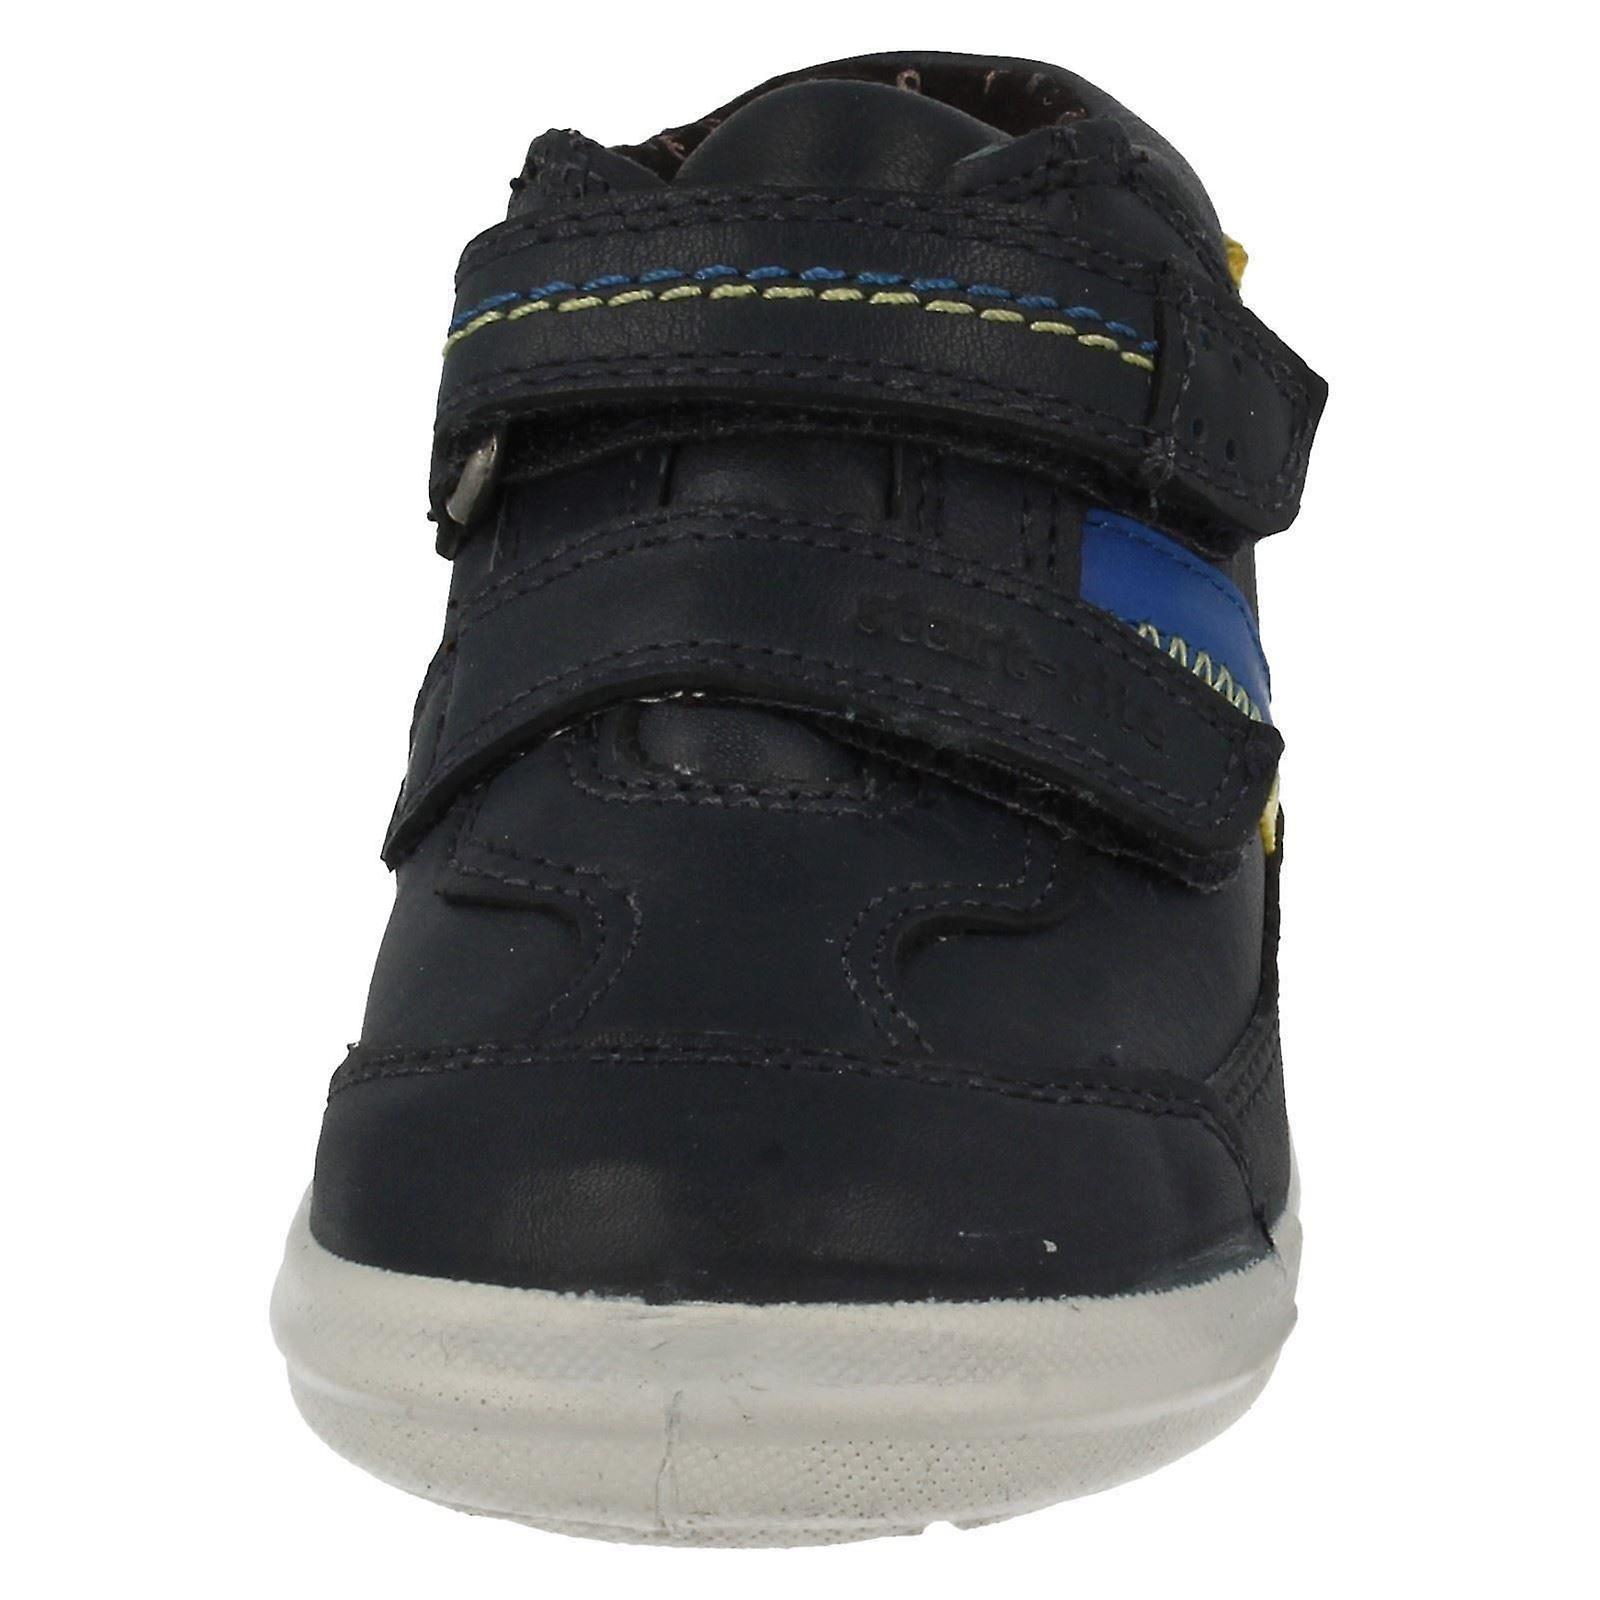 Boys Aqua Rite by Startrite Ankle Boots Aqua Jump